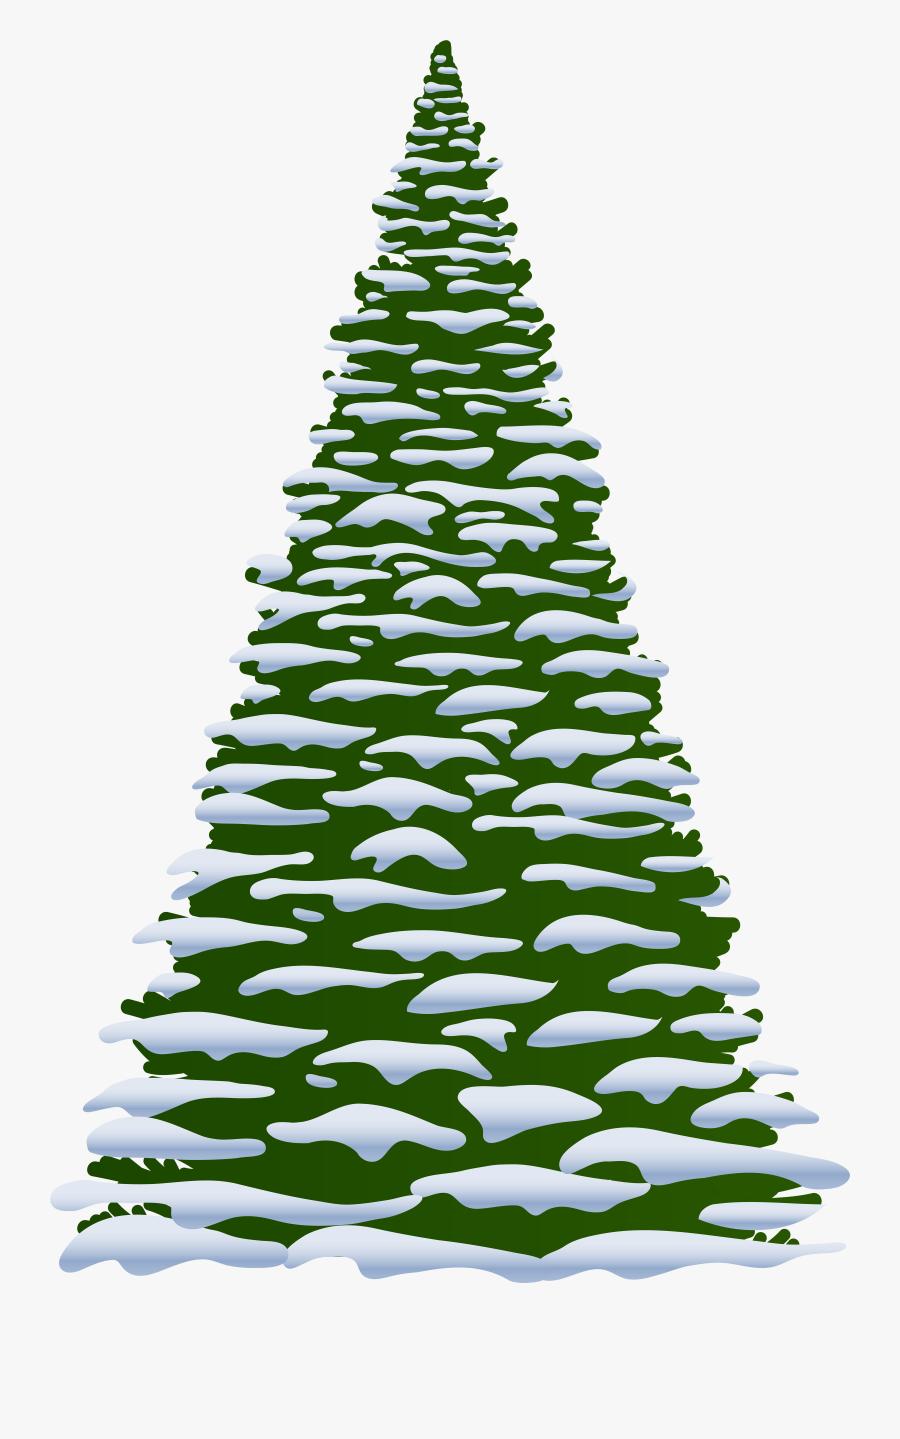 Pine Tree Clip Art Wedding Clipart - Winter Pine Tree Clipart, Transparent Clipart